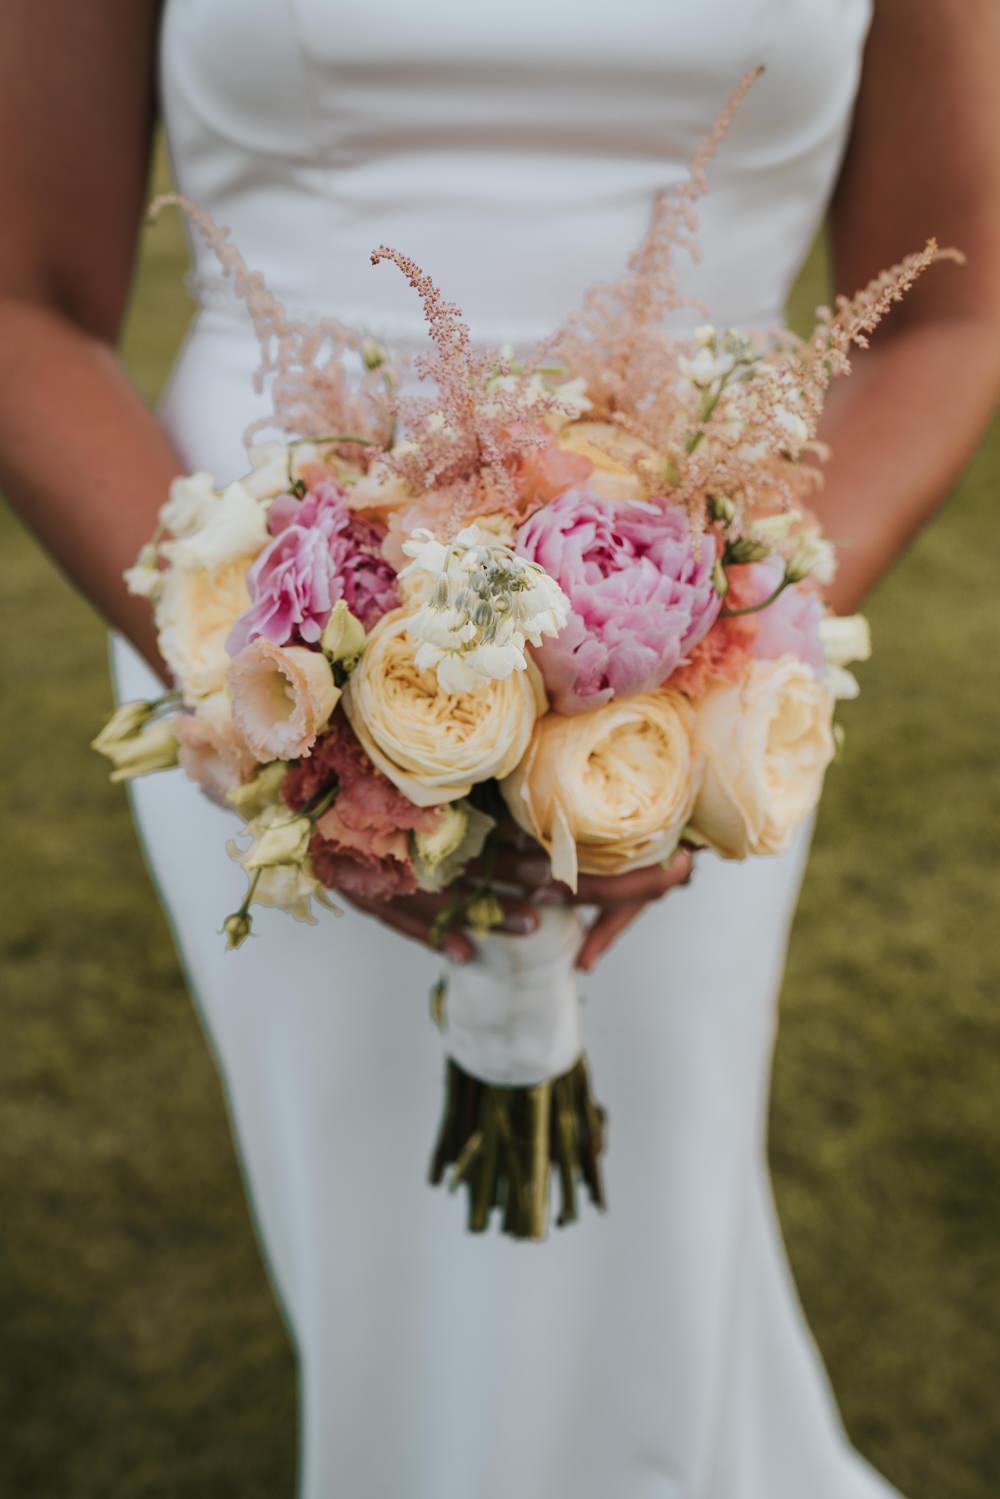 Bouquet Flowers Bride Bridal Bridesmaid Peach Pink Rose Peony Astilbe High House Weddings Grace Elizabeth Photography